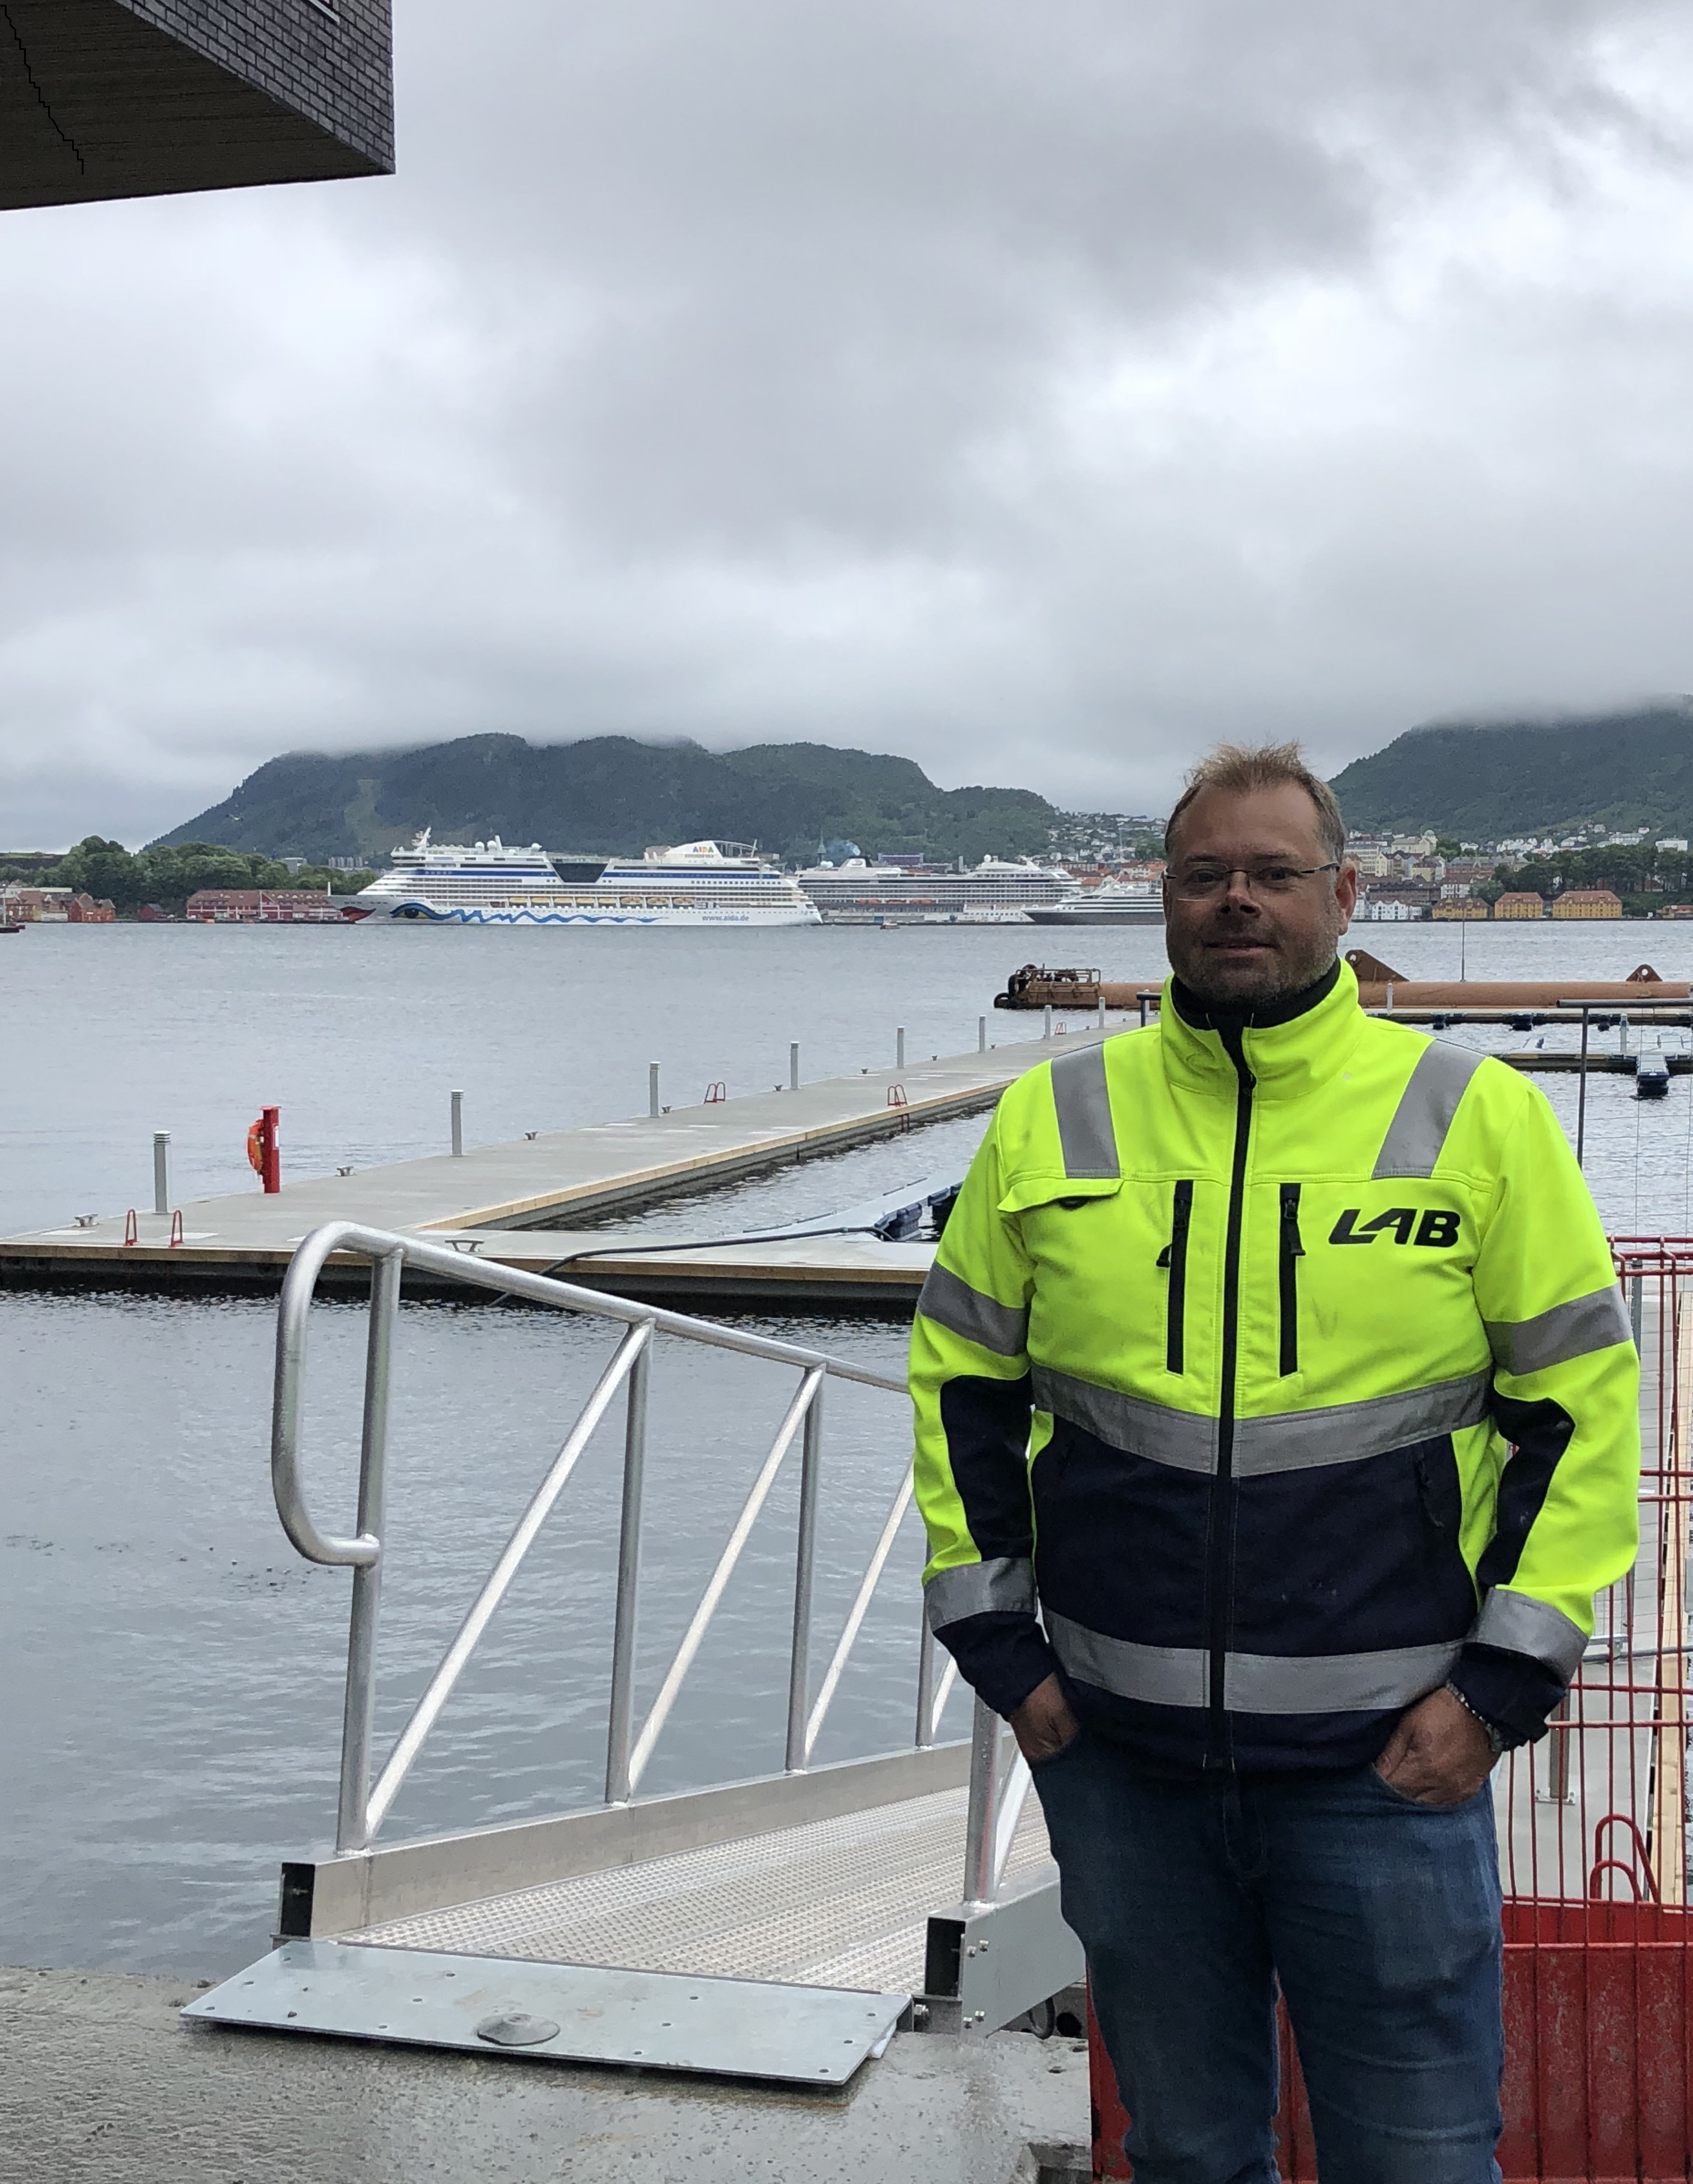 https://marinasolutions.no/uploads/overlevering-med-Knut-Helge-Iversen-Byggleder-i-LAB.jpg